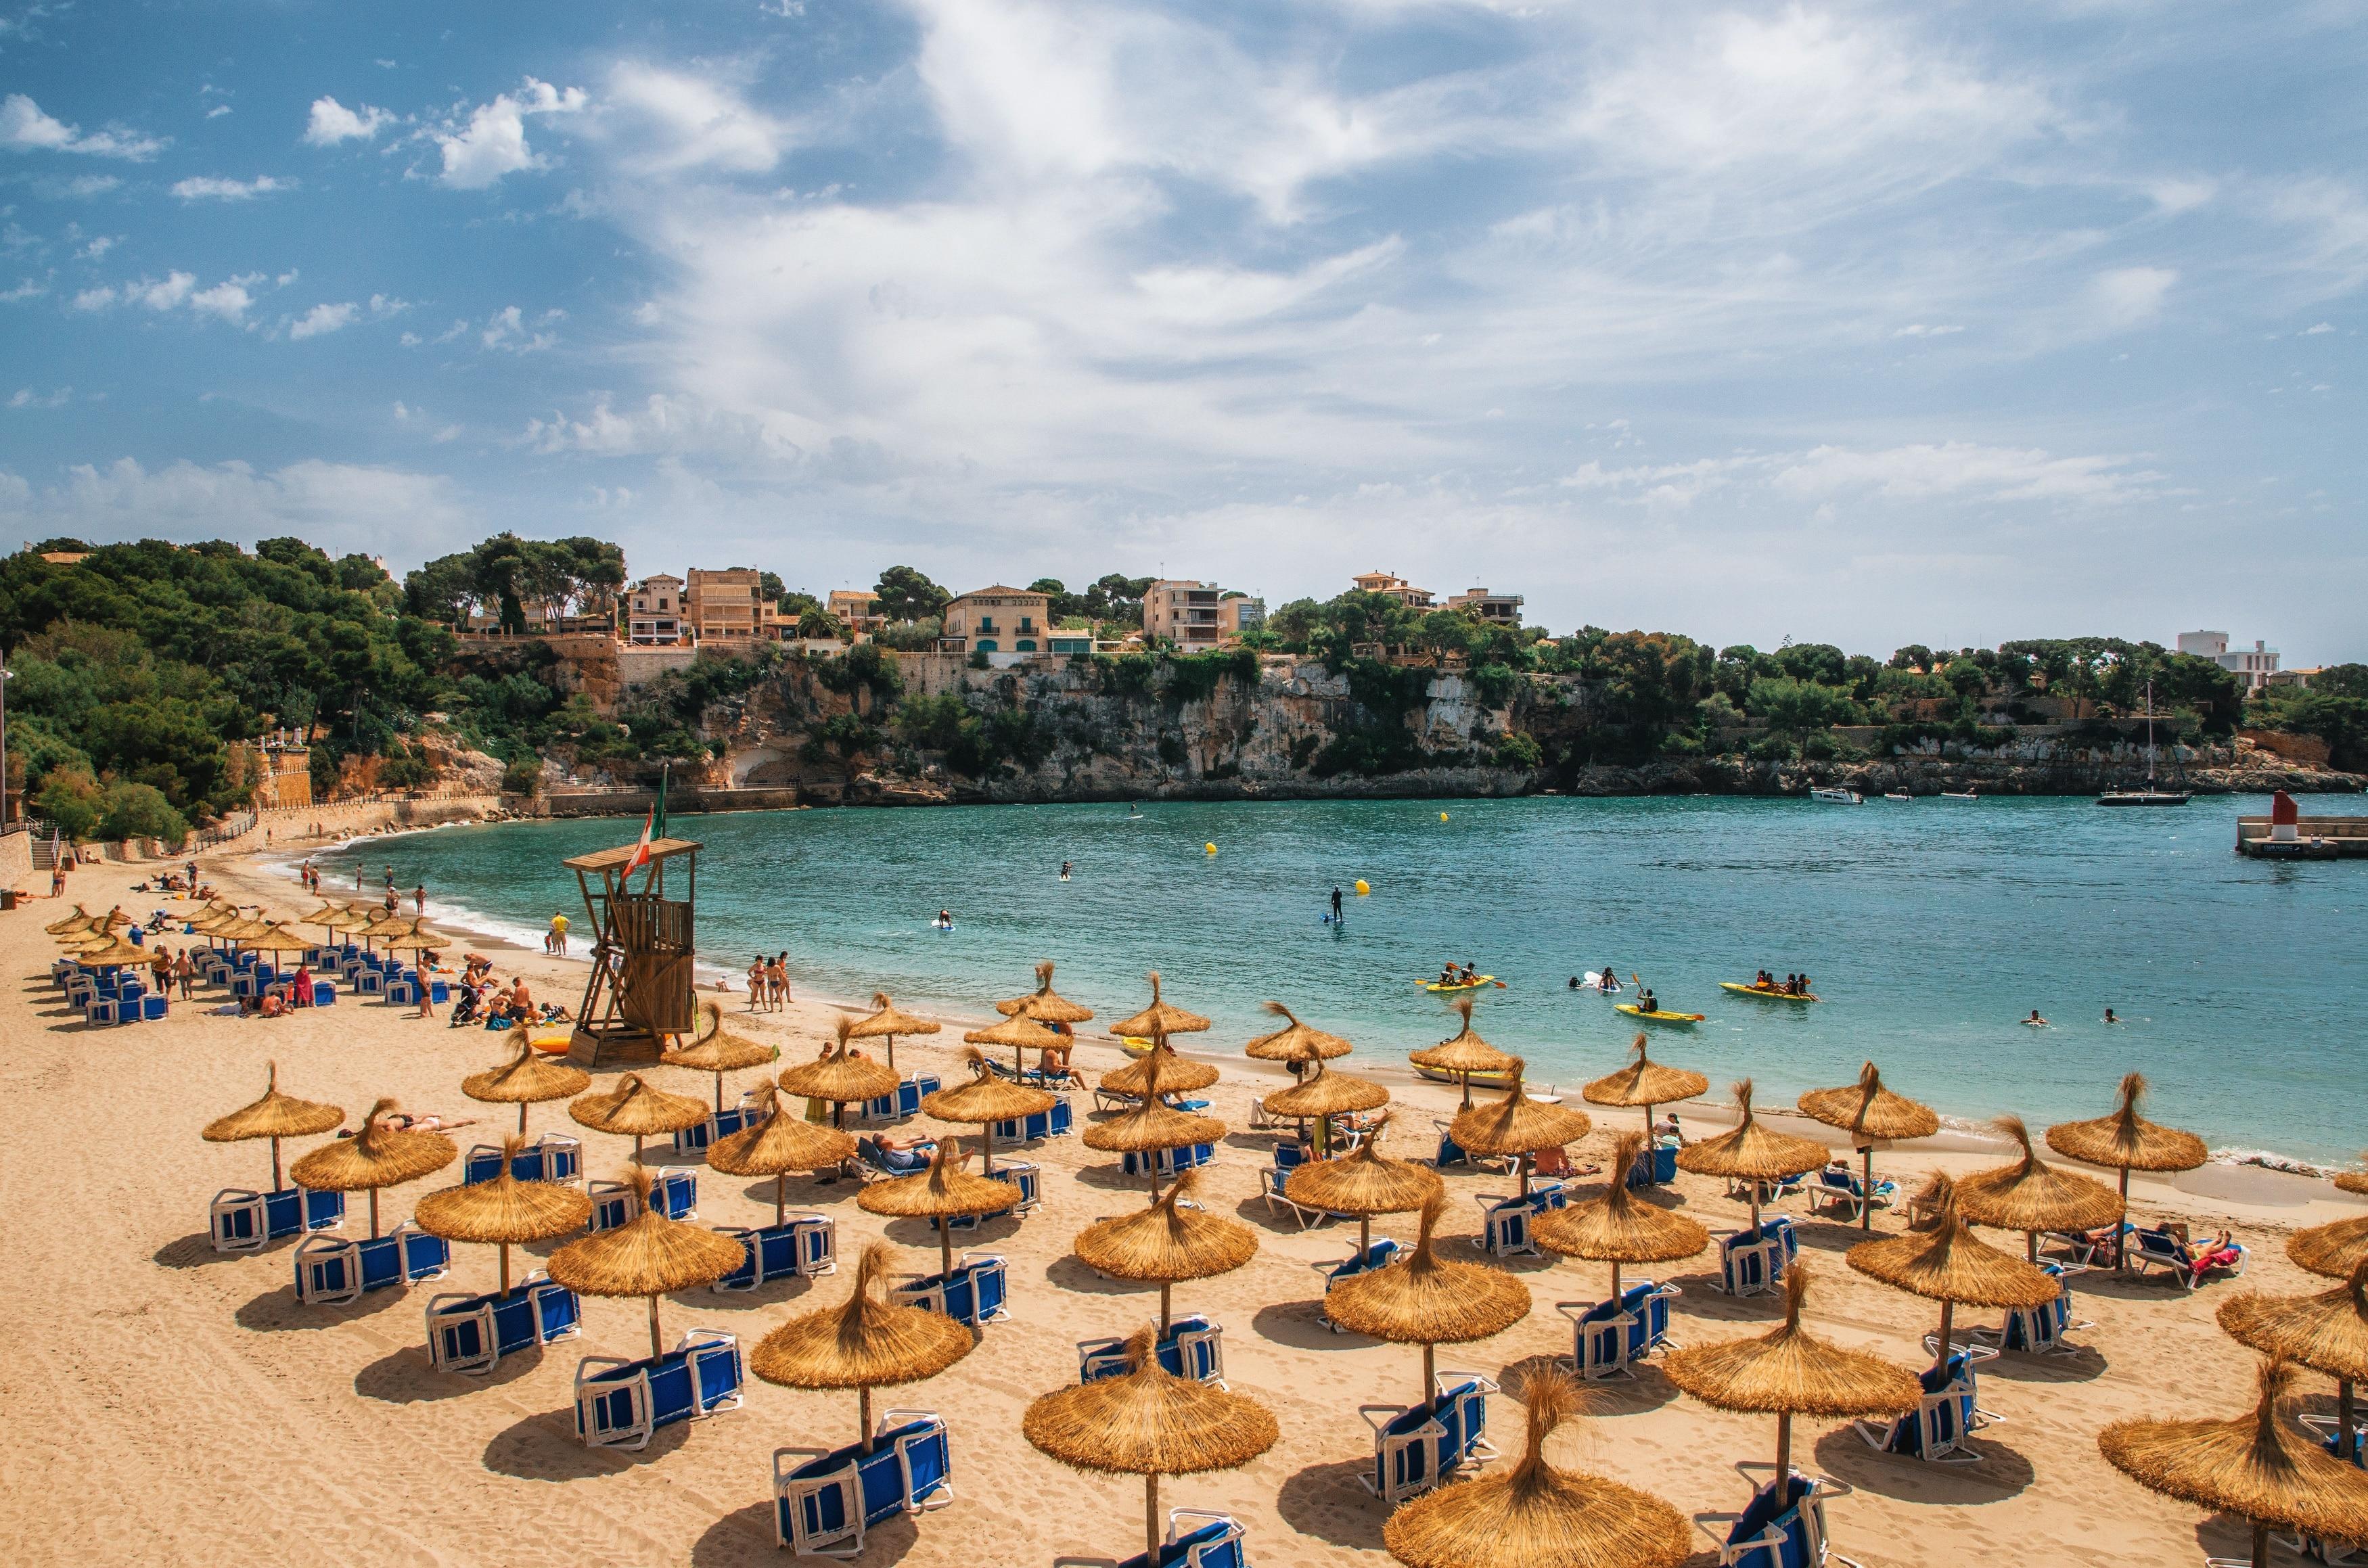 Playa de Porto Cristo, Manacor, Balearic Islands, Spain